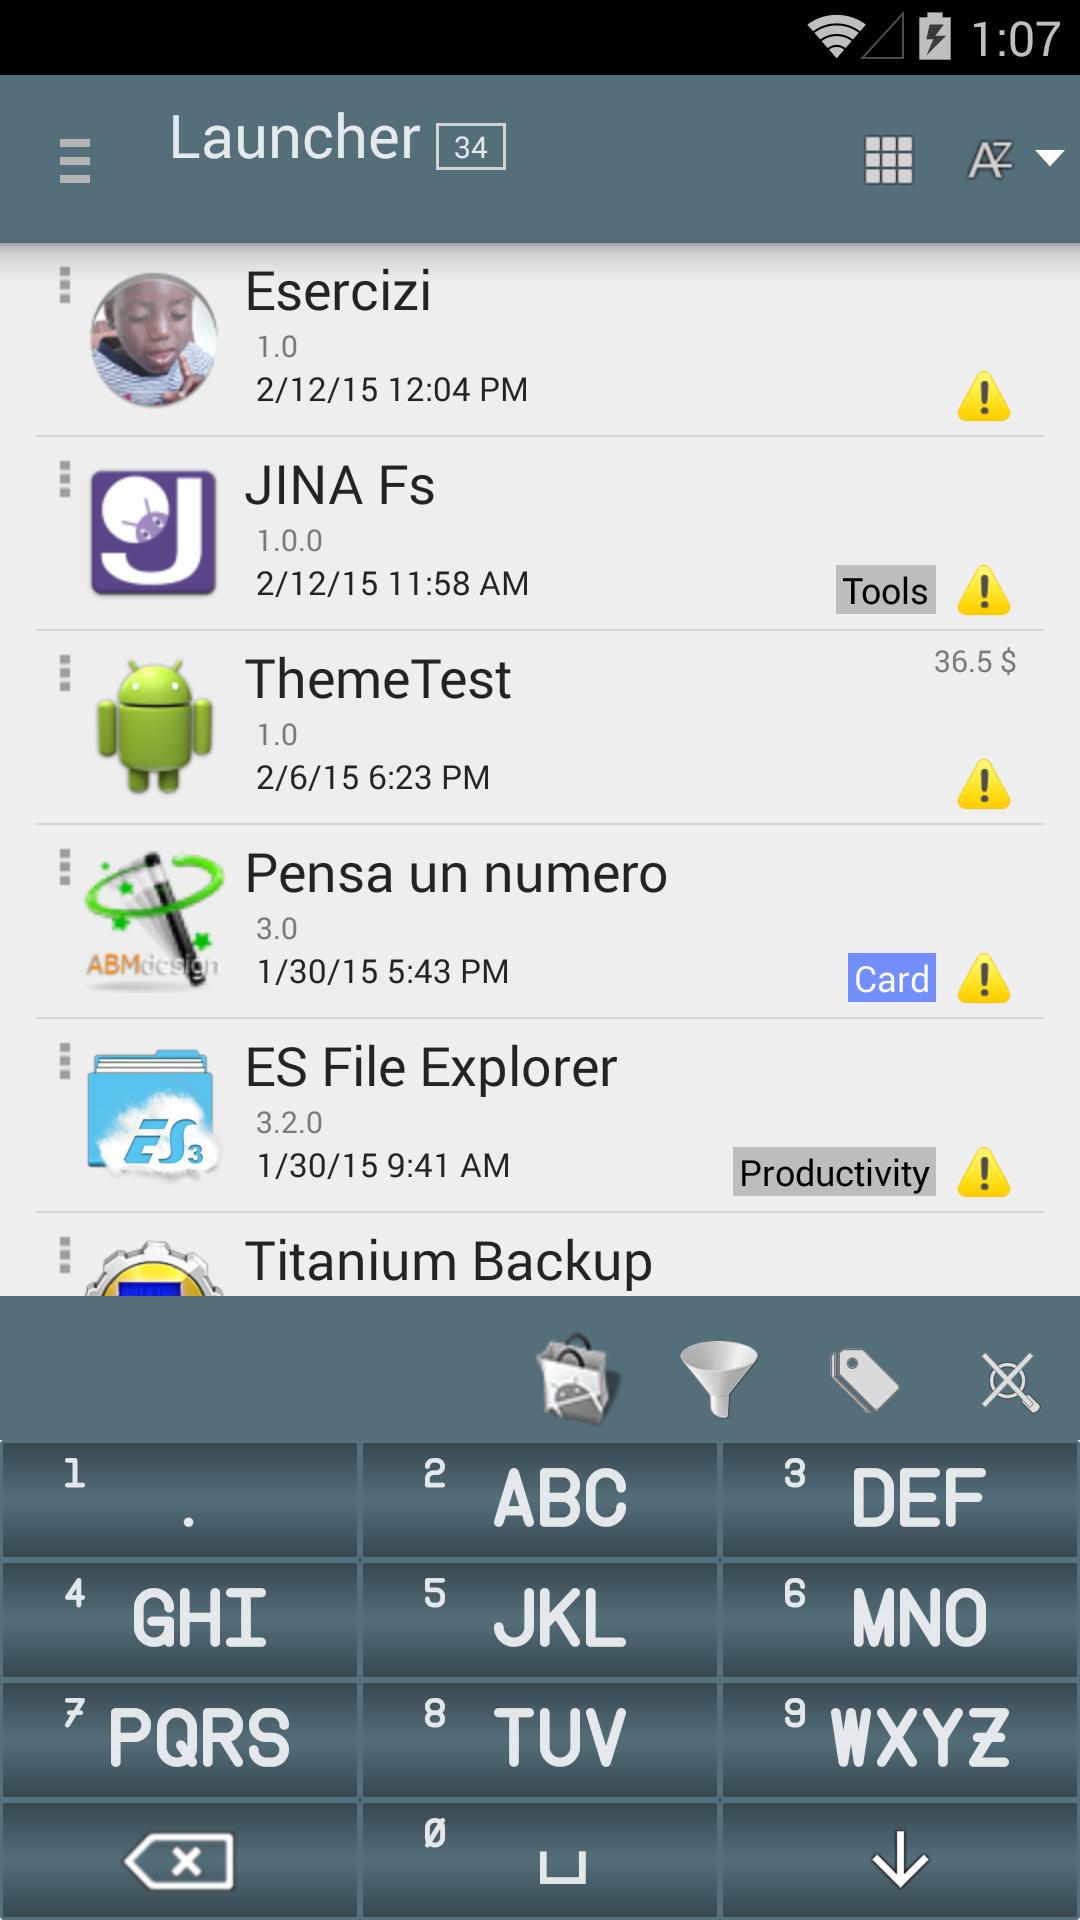 JINA Fs App Organizer